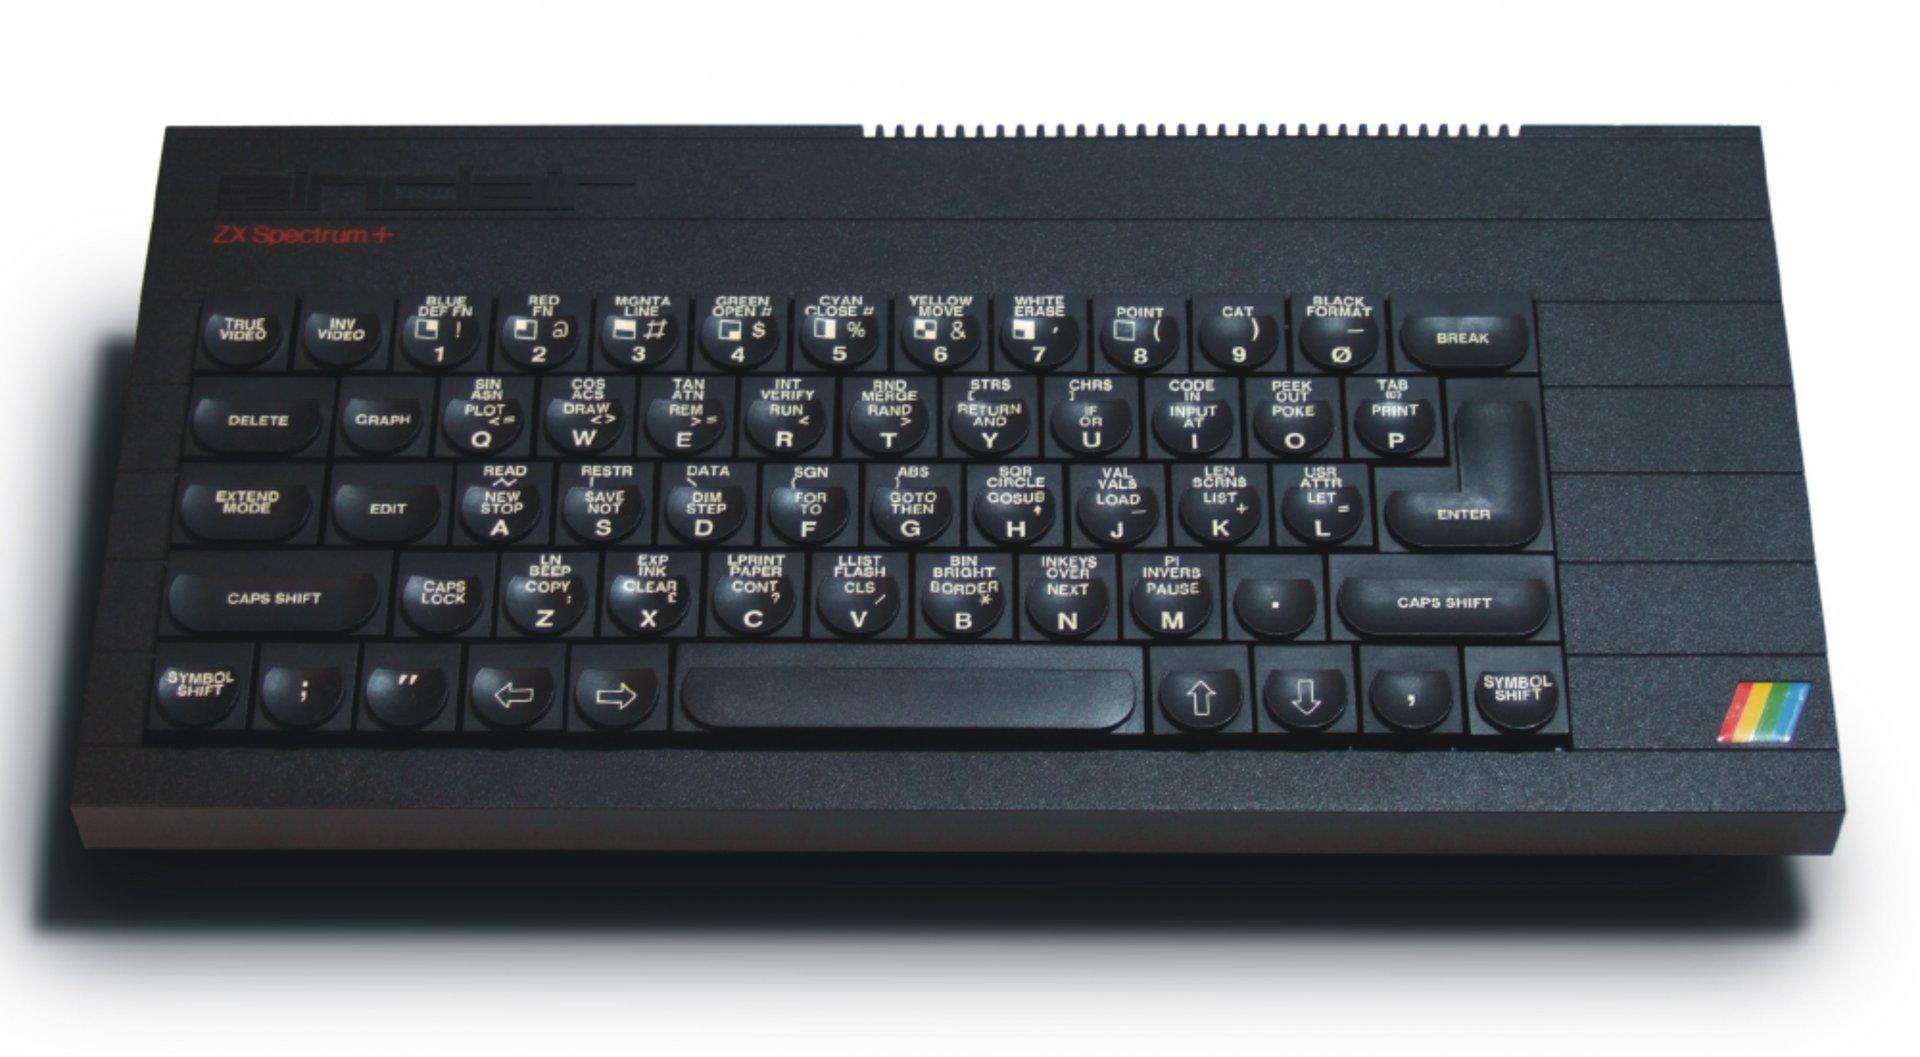 ZX_Spectrum+.JPG